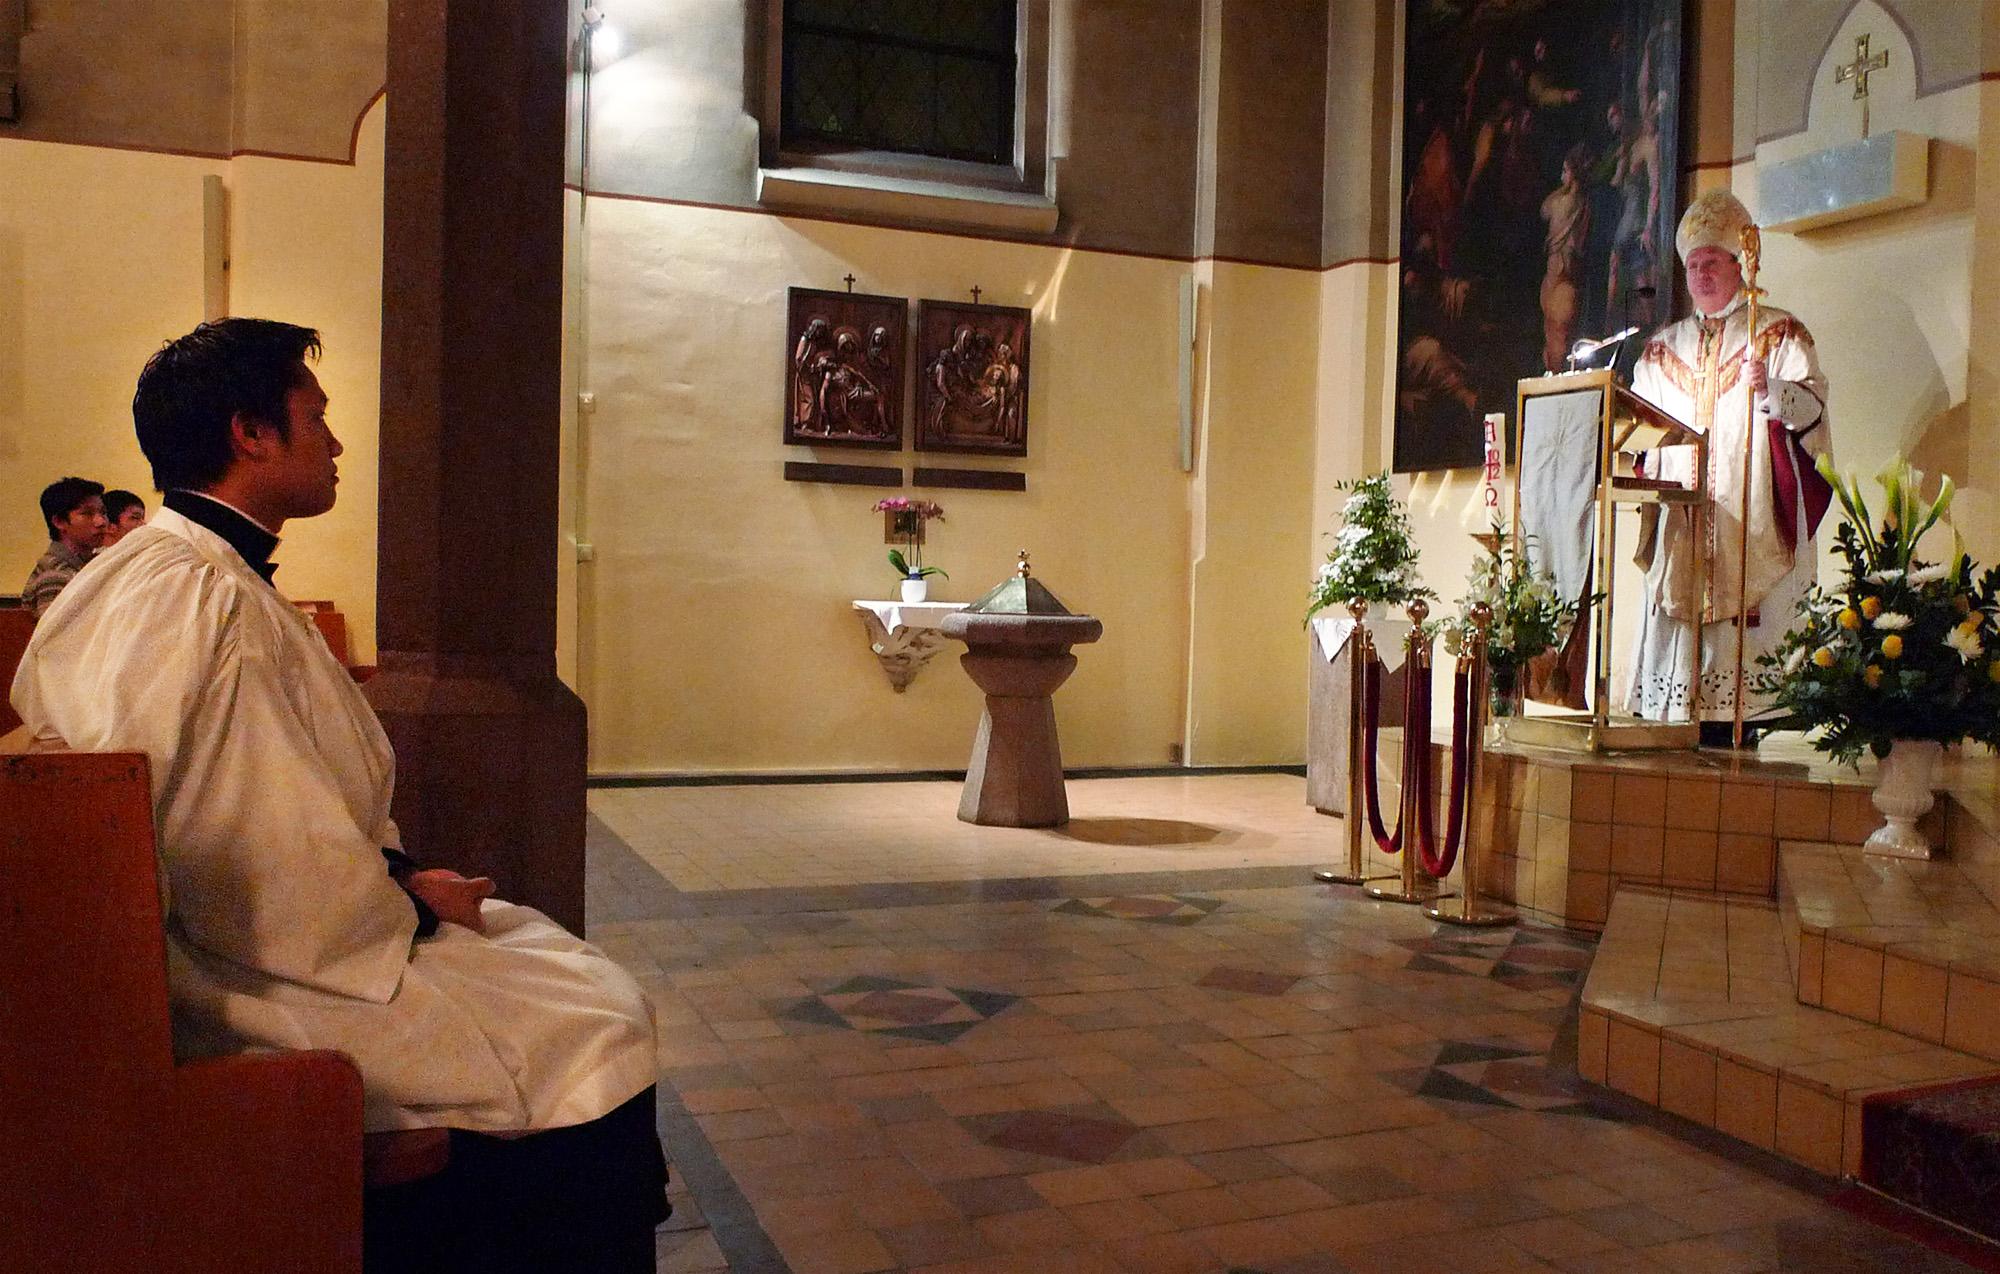 Biskop Bernt preker blant annet om hva lektoratet innebærer (Foto: Henriette Teige)